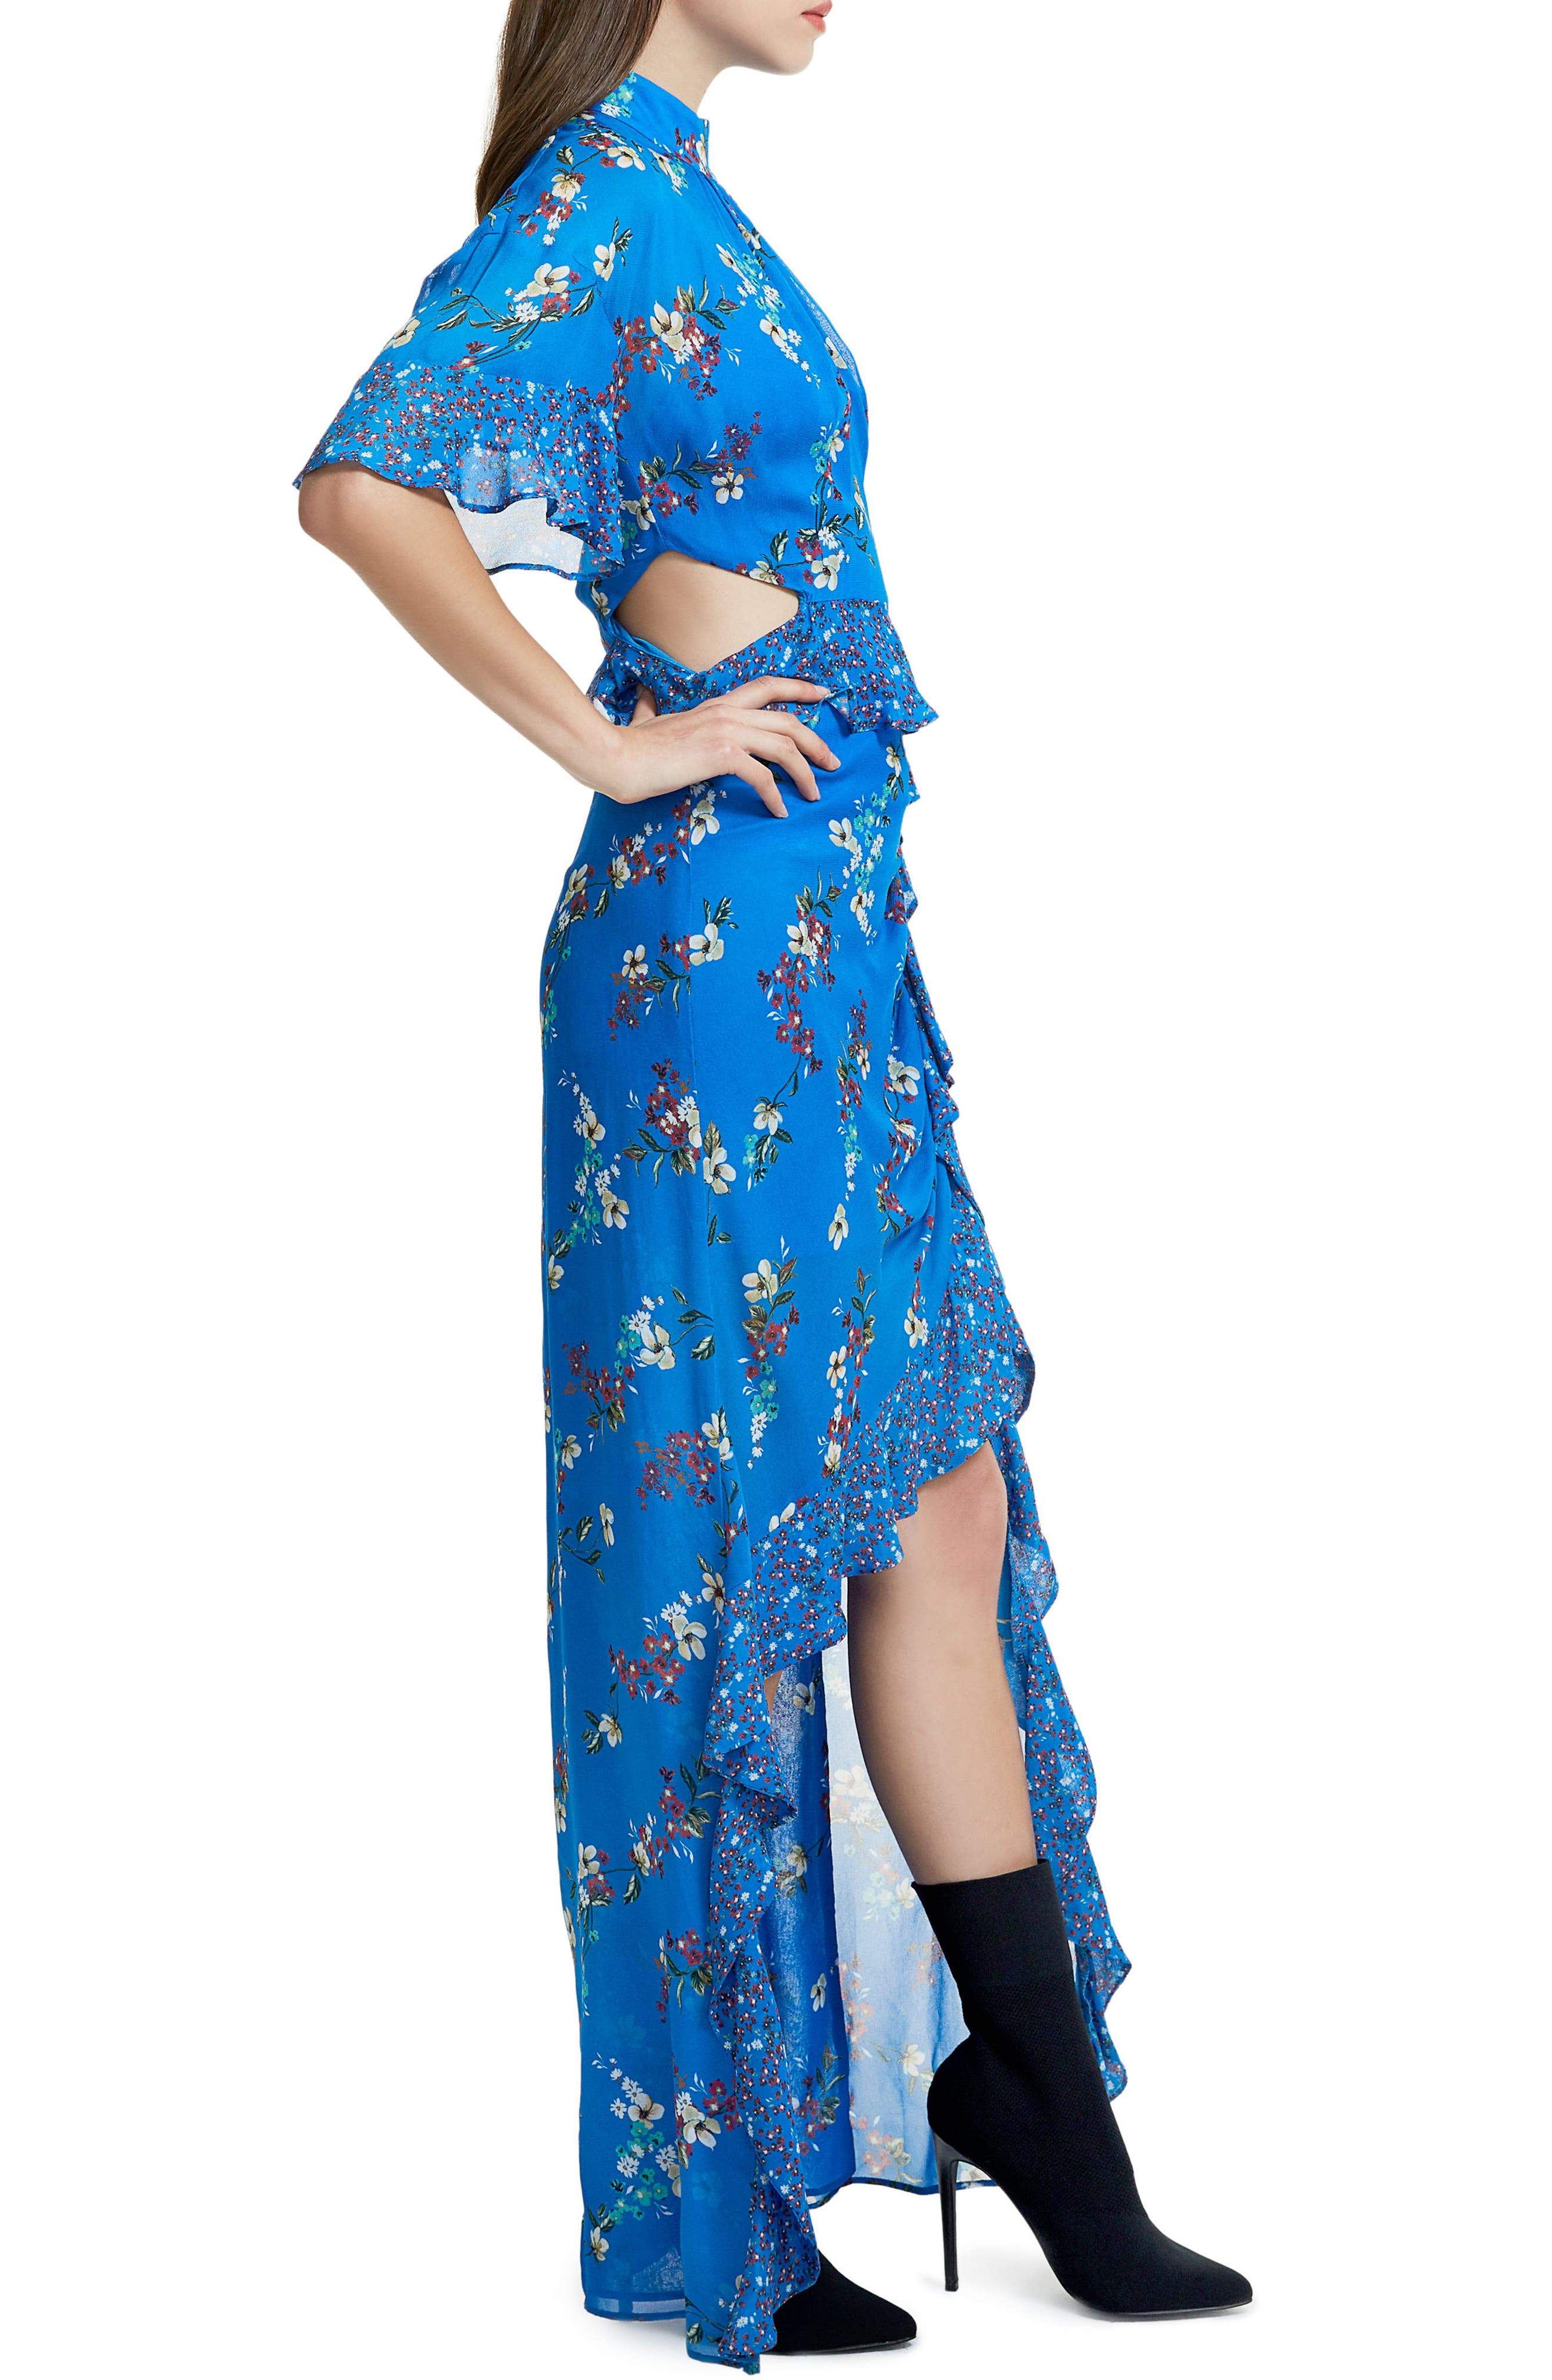 Melsa Cutout Maxi Dress,                             Alternate thumbnail 3, color,